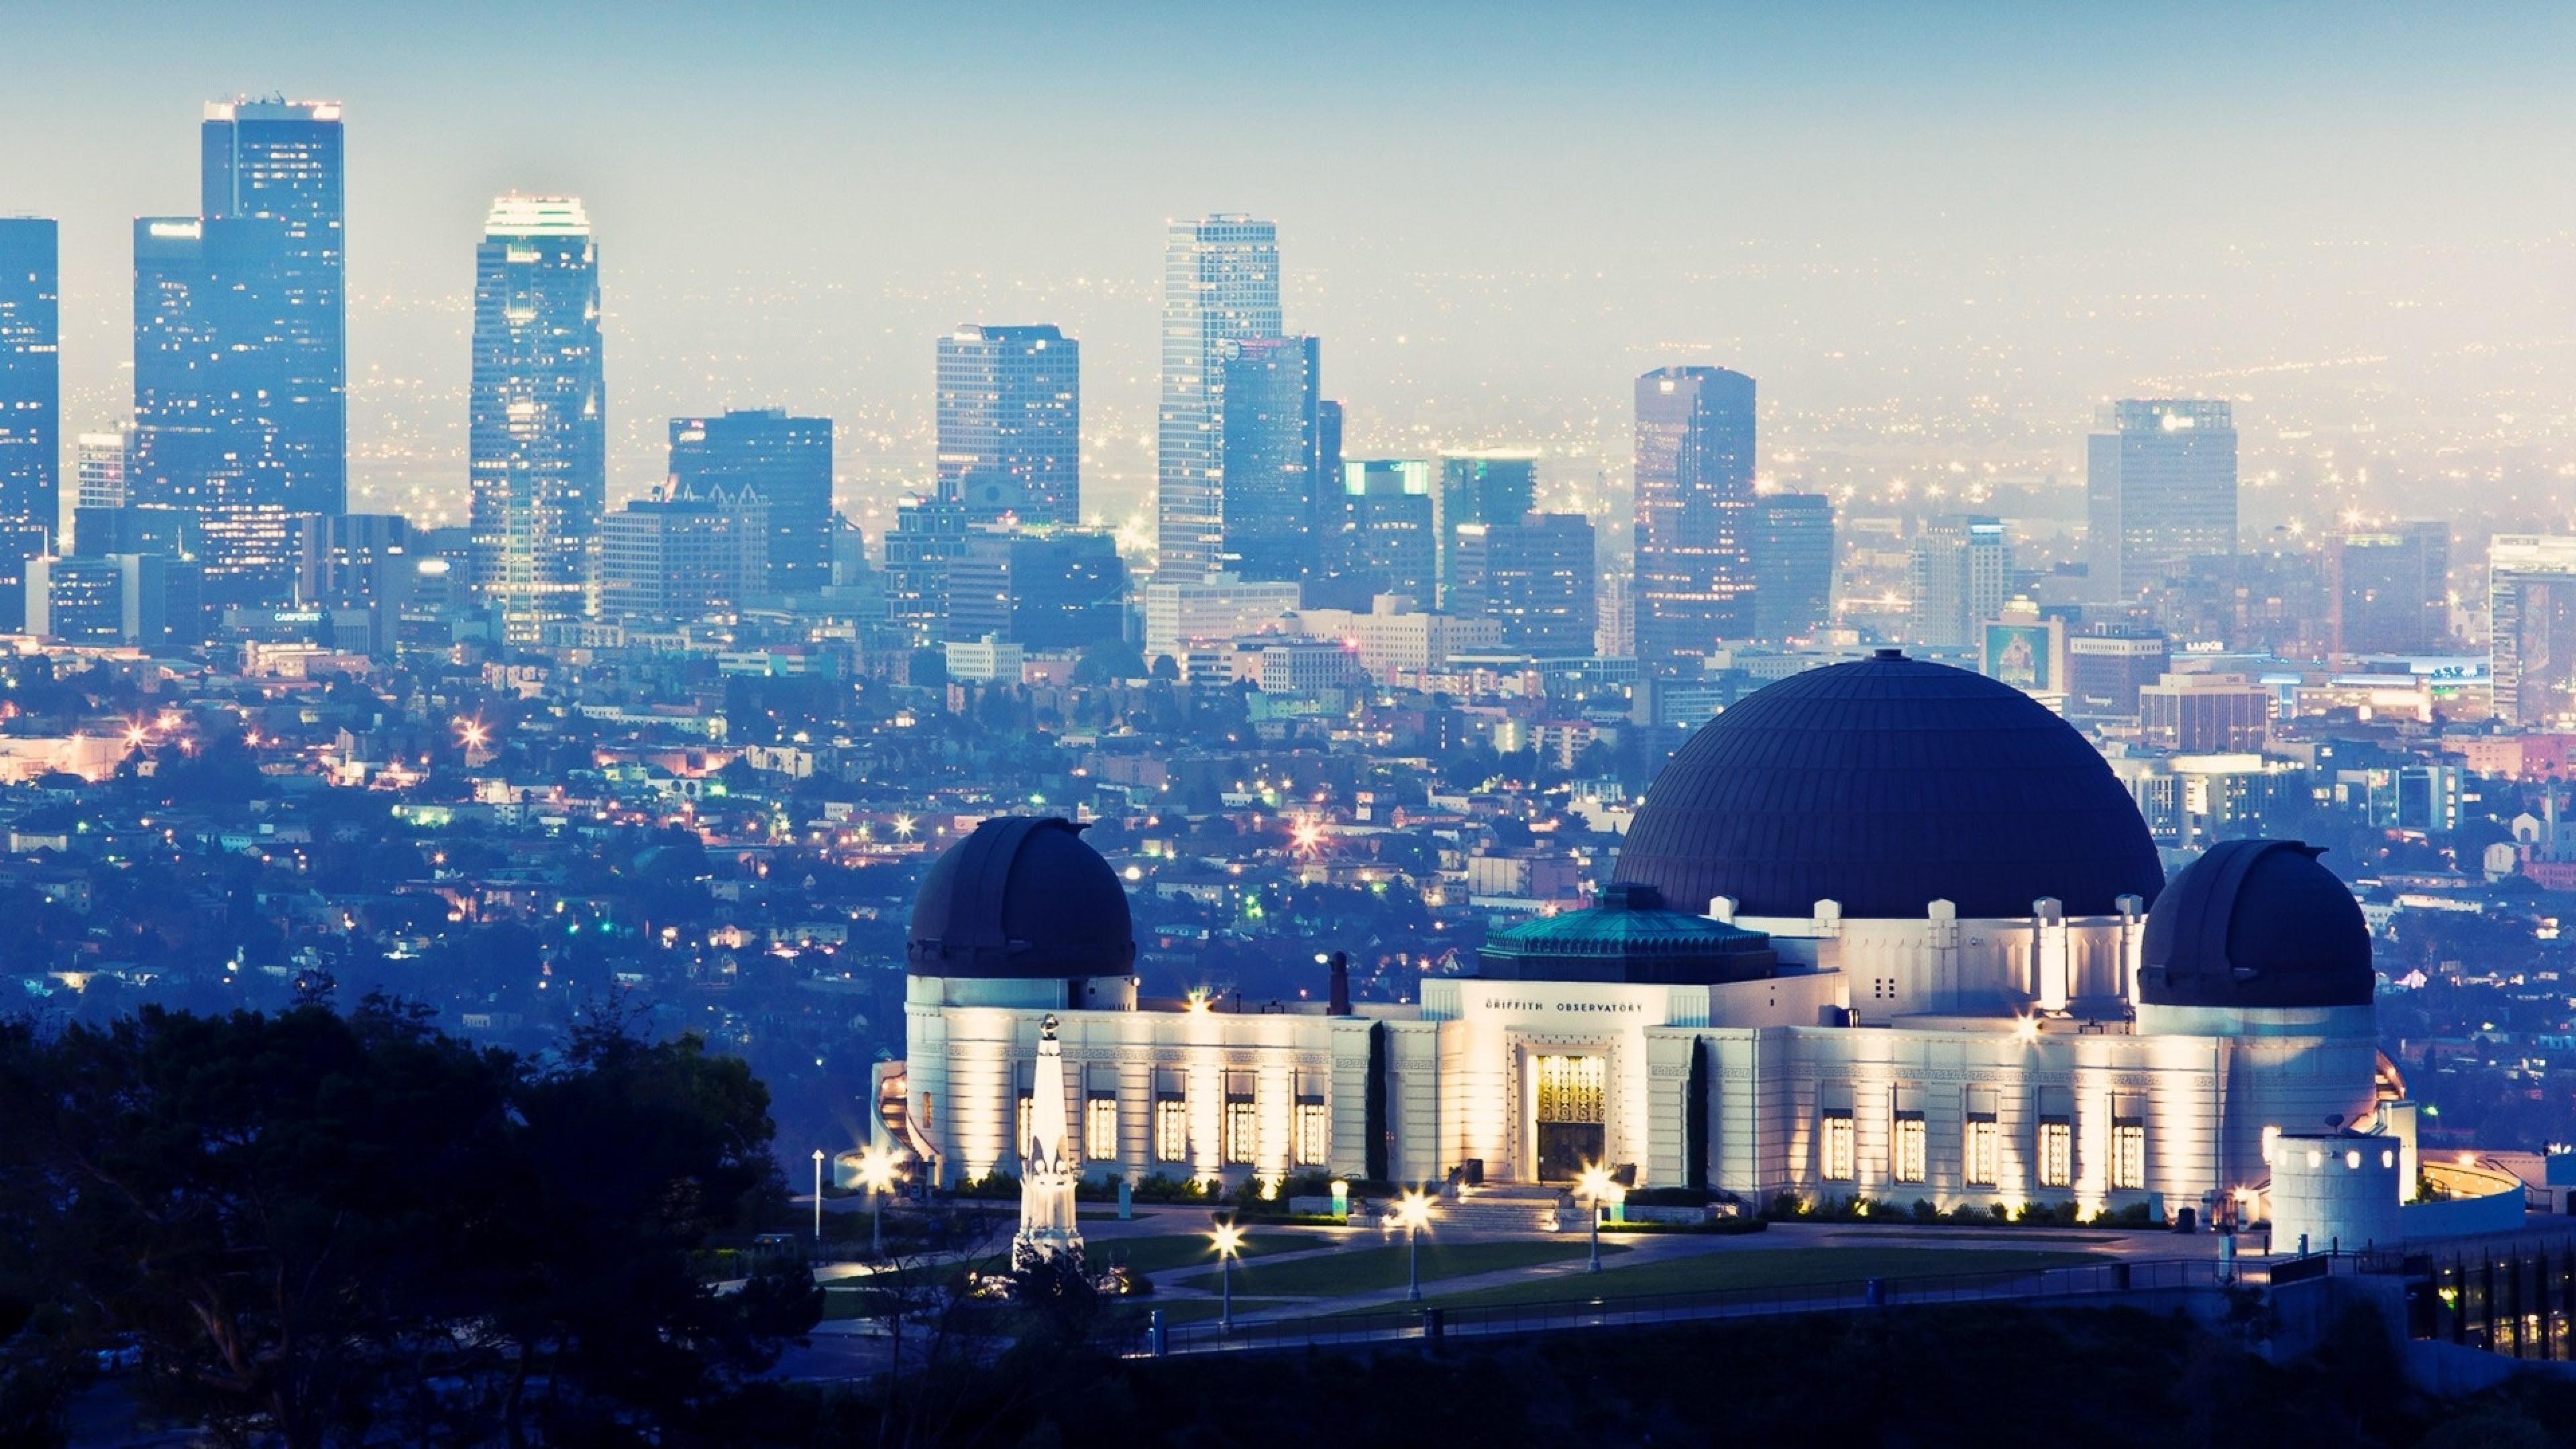 Los Angeles 4K Wallpaper 56+ images